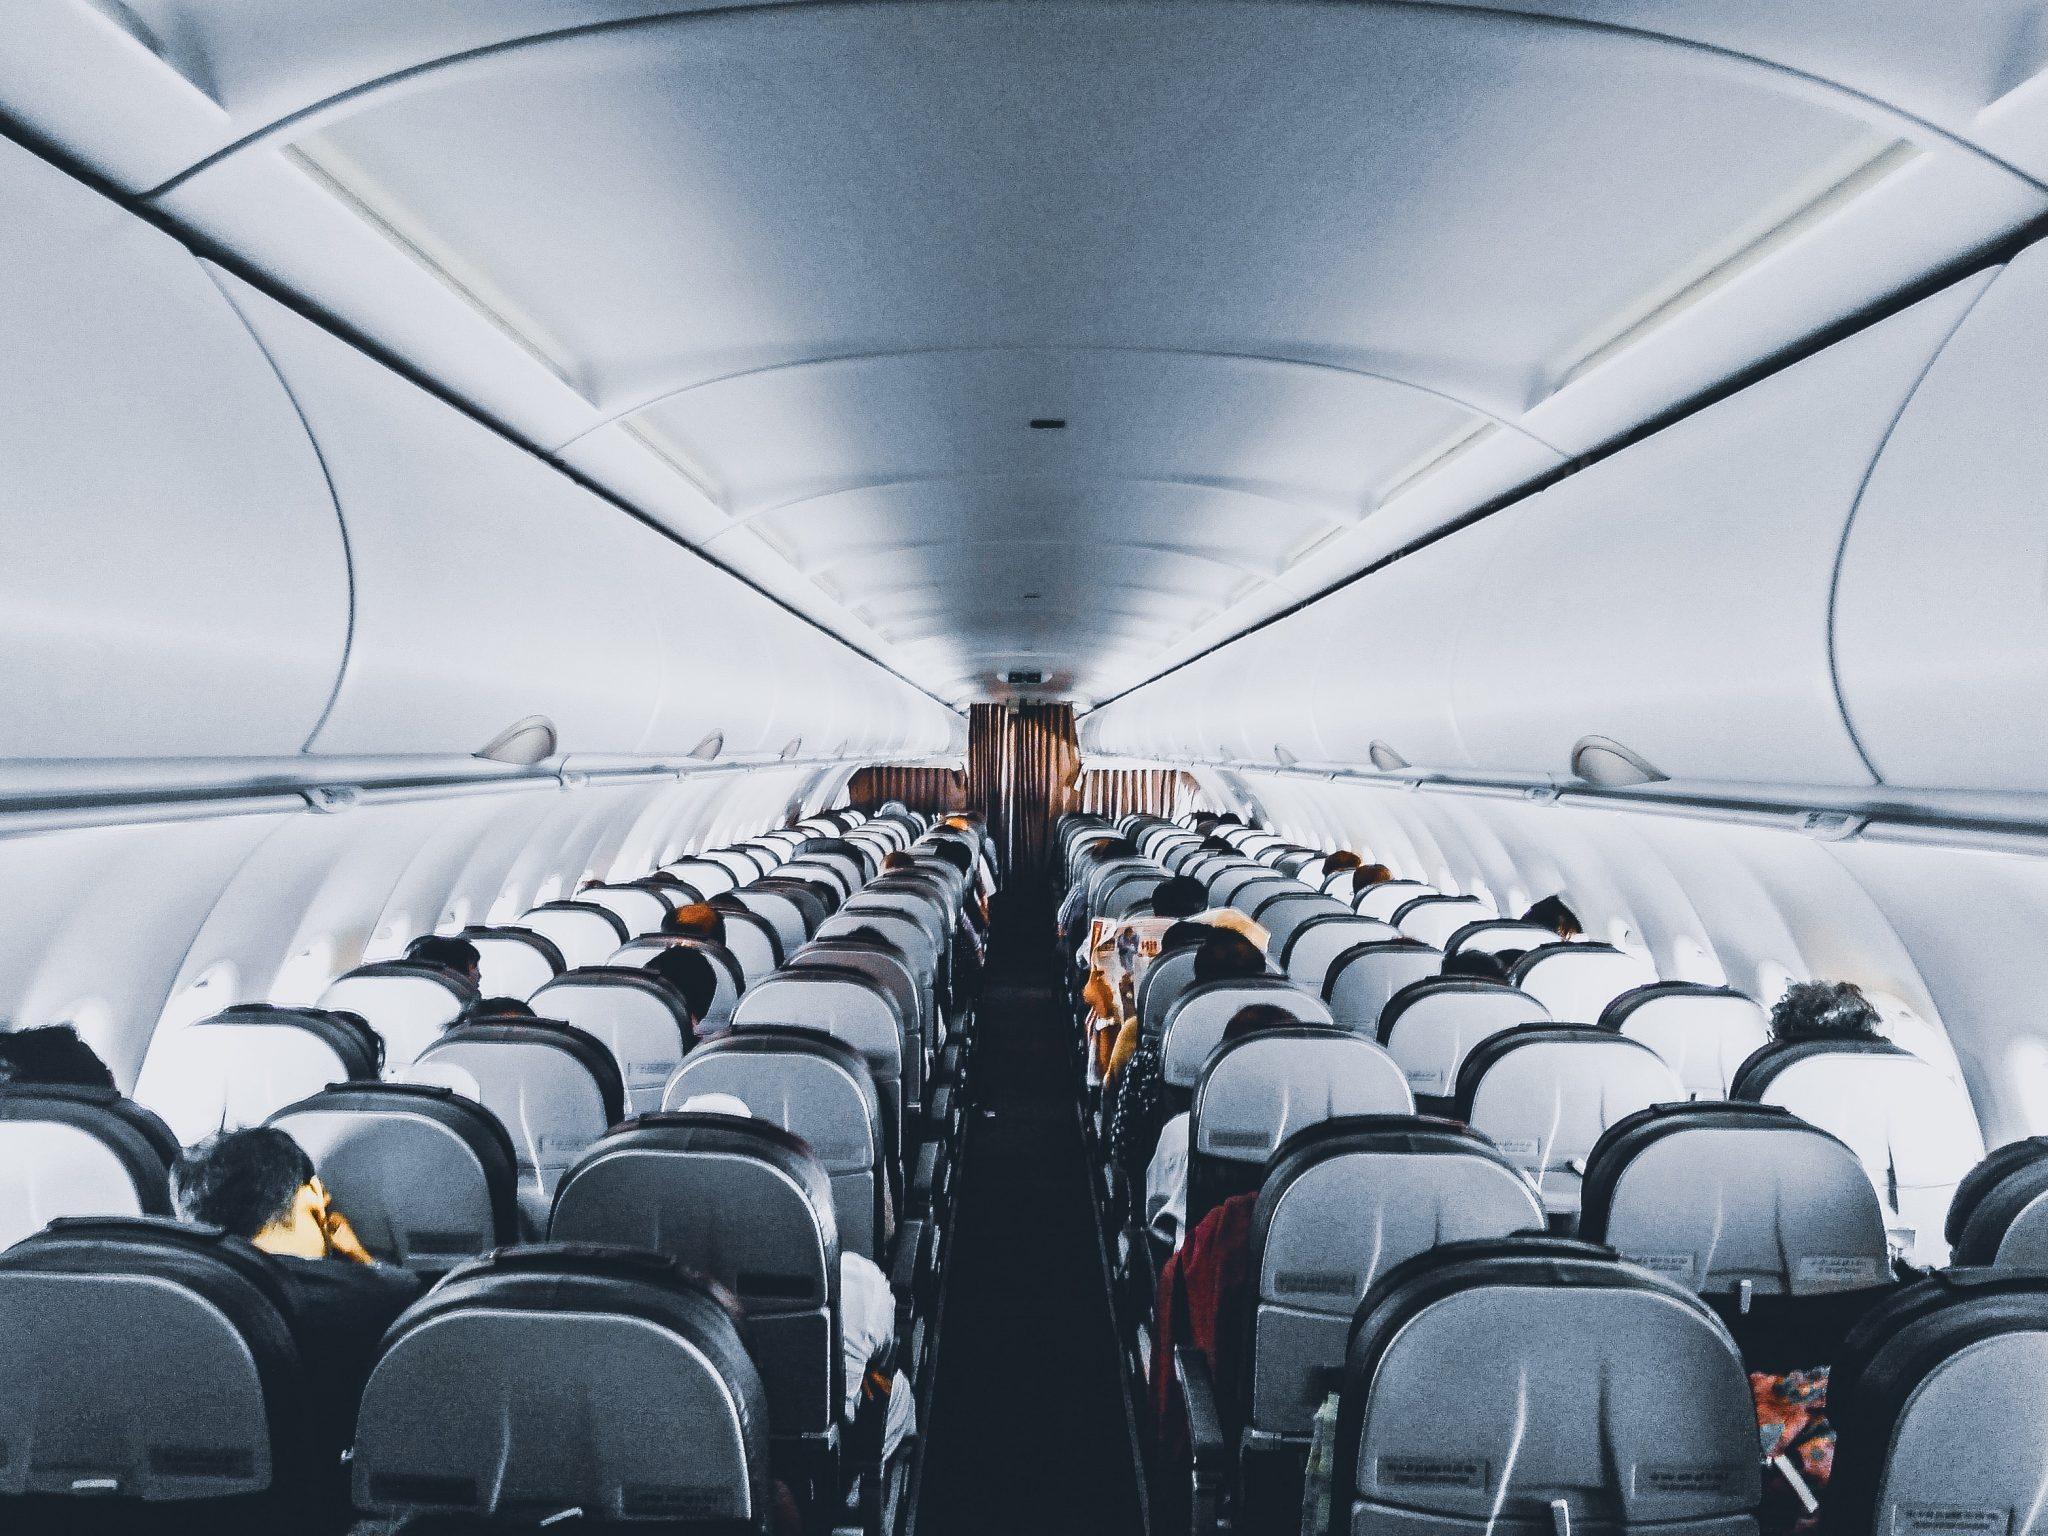 commercial aircraft interior